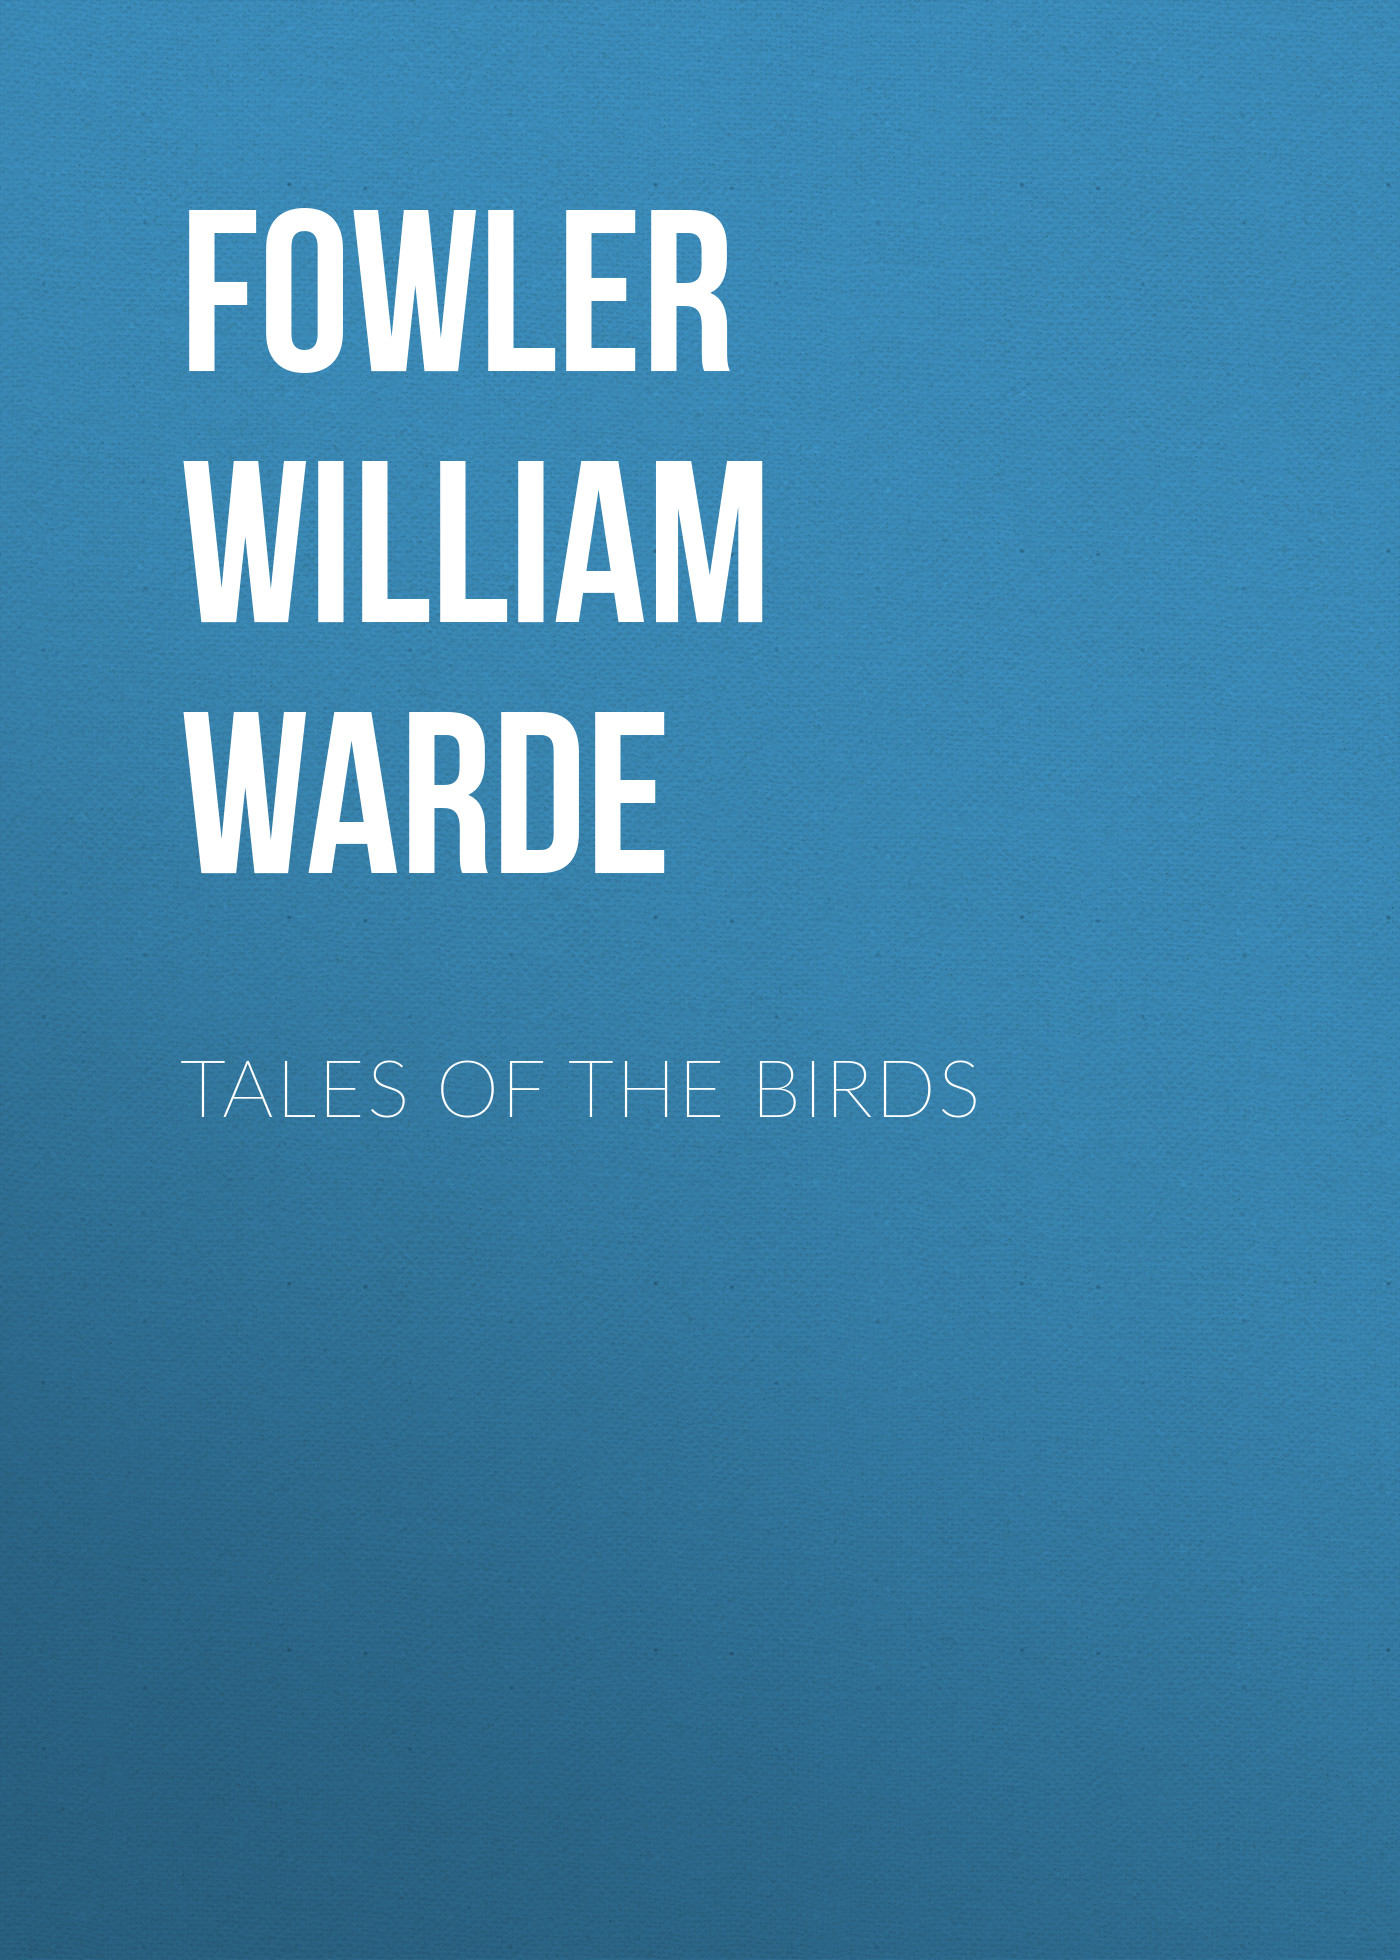 лучшая цена Fowler William Warde Tales of the birds